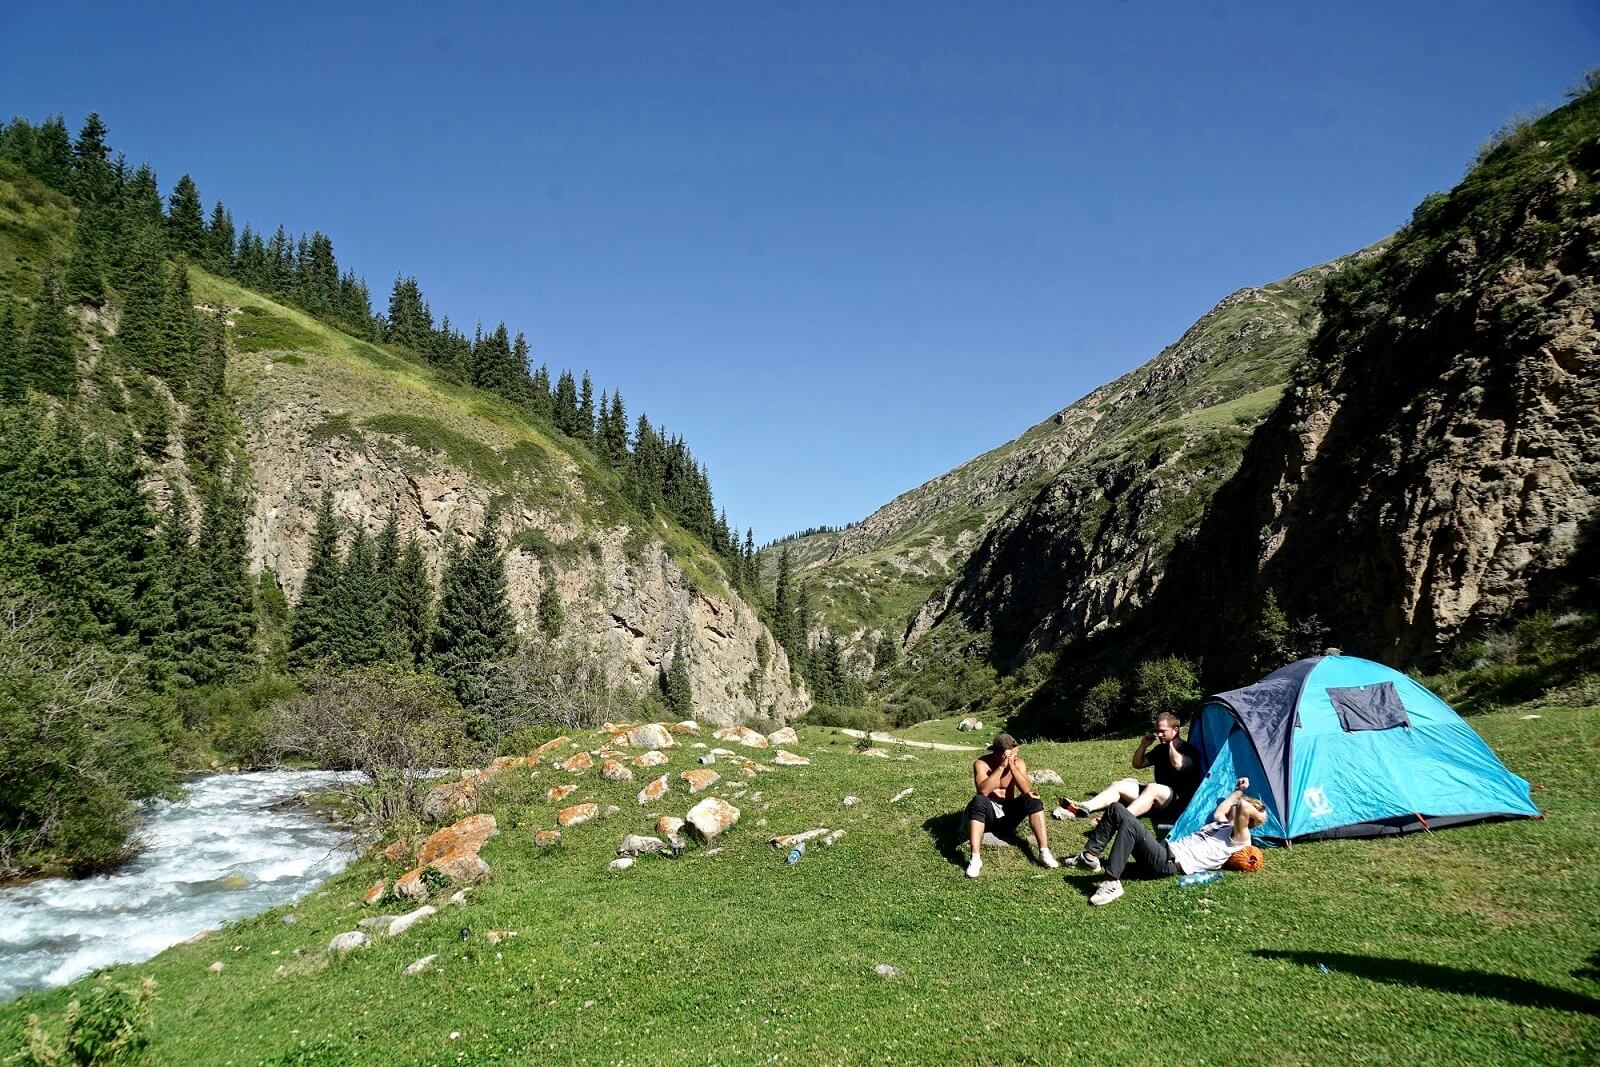 4-camping-in-mountains-kyrgyzstan